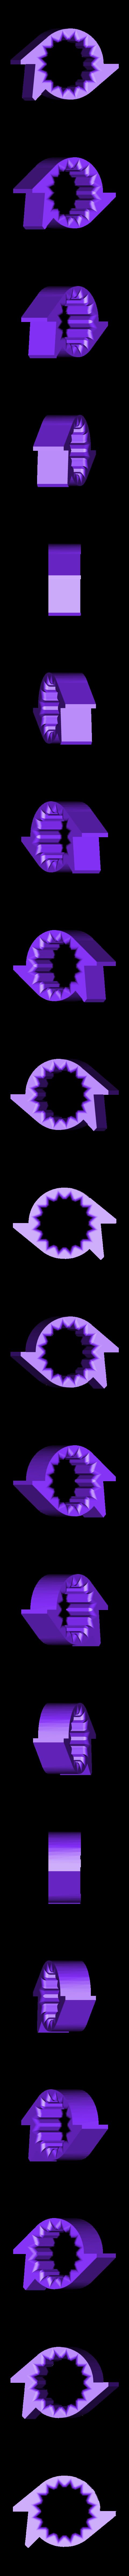 Cam_bolt_16b_3beats.STL Download free STL file My 3D (Dream Drum Design) • 3D print design, Tanleste46